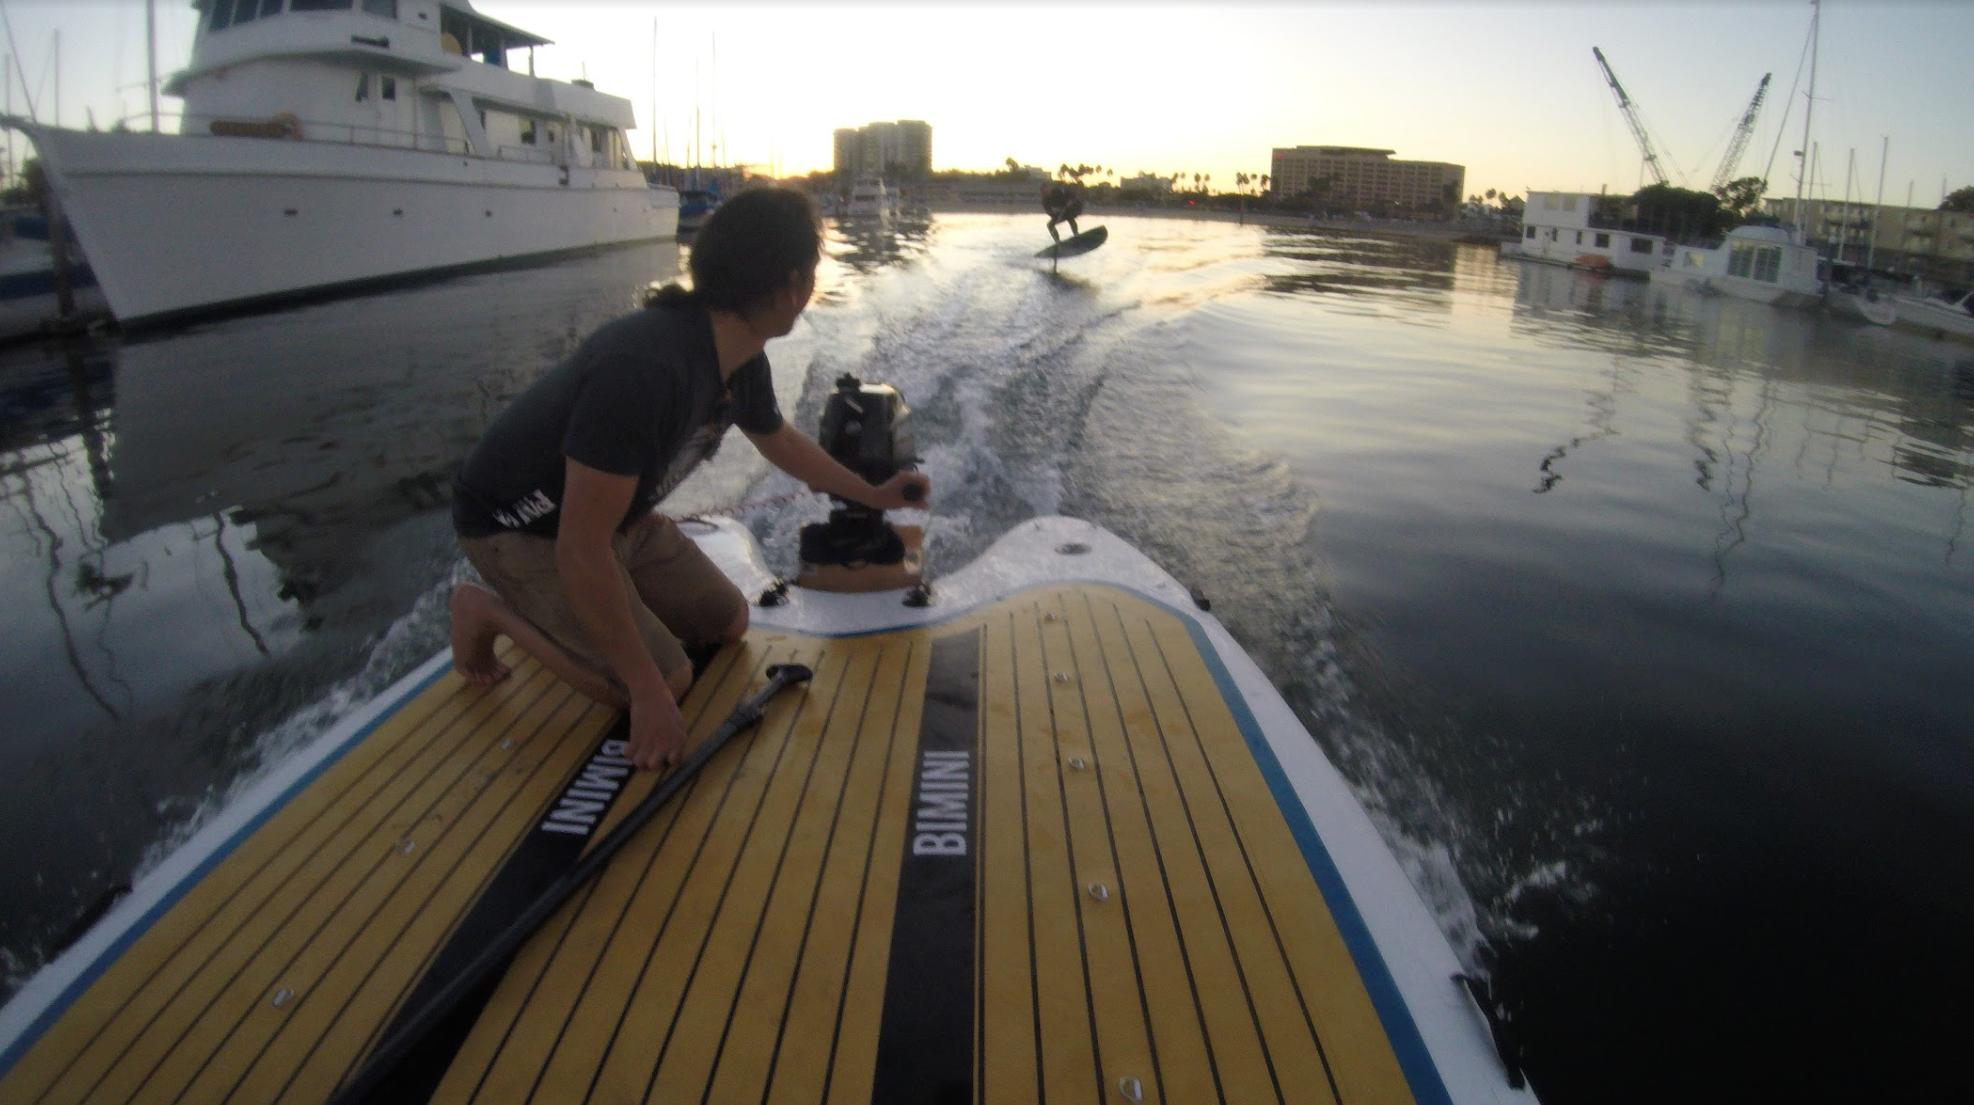 Bimini pau hana sup in Venice with hydrofoil dragging